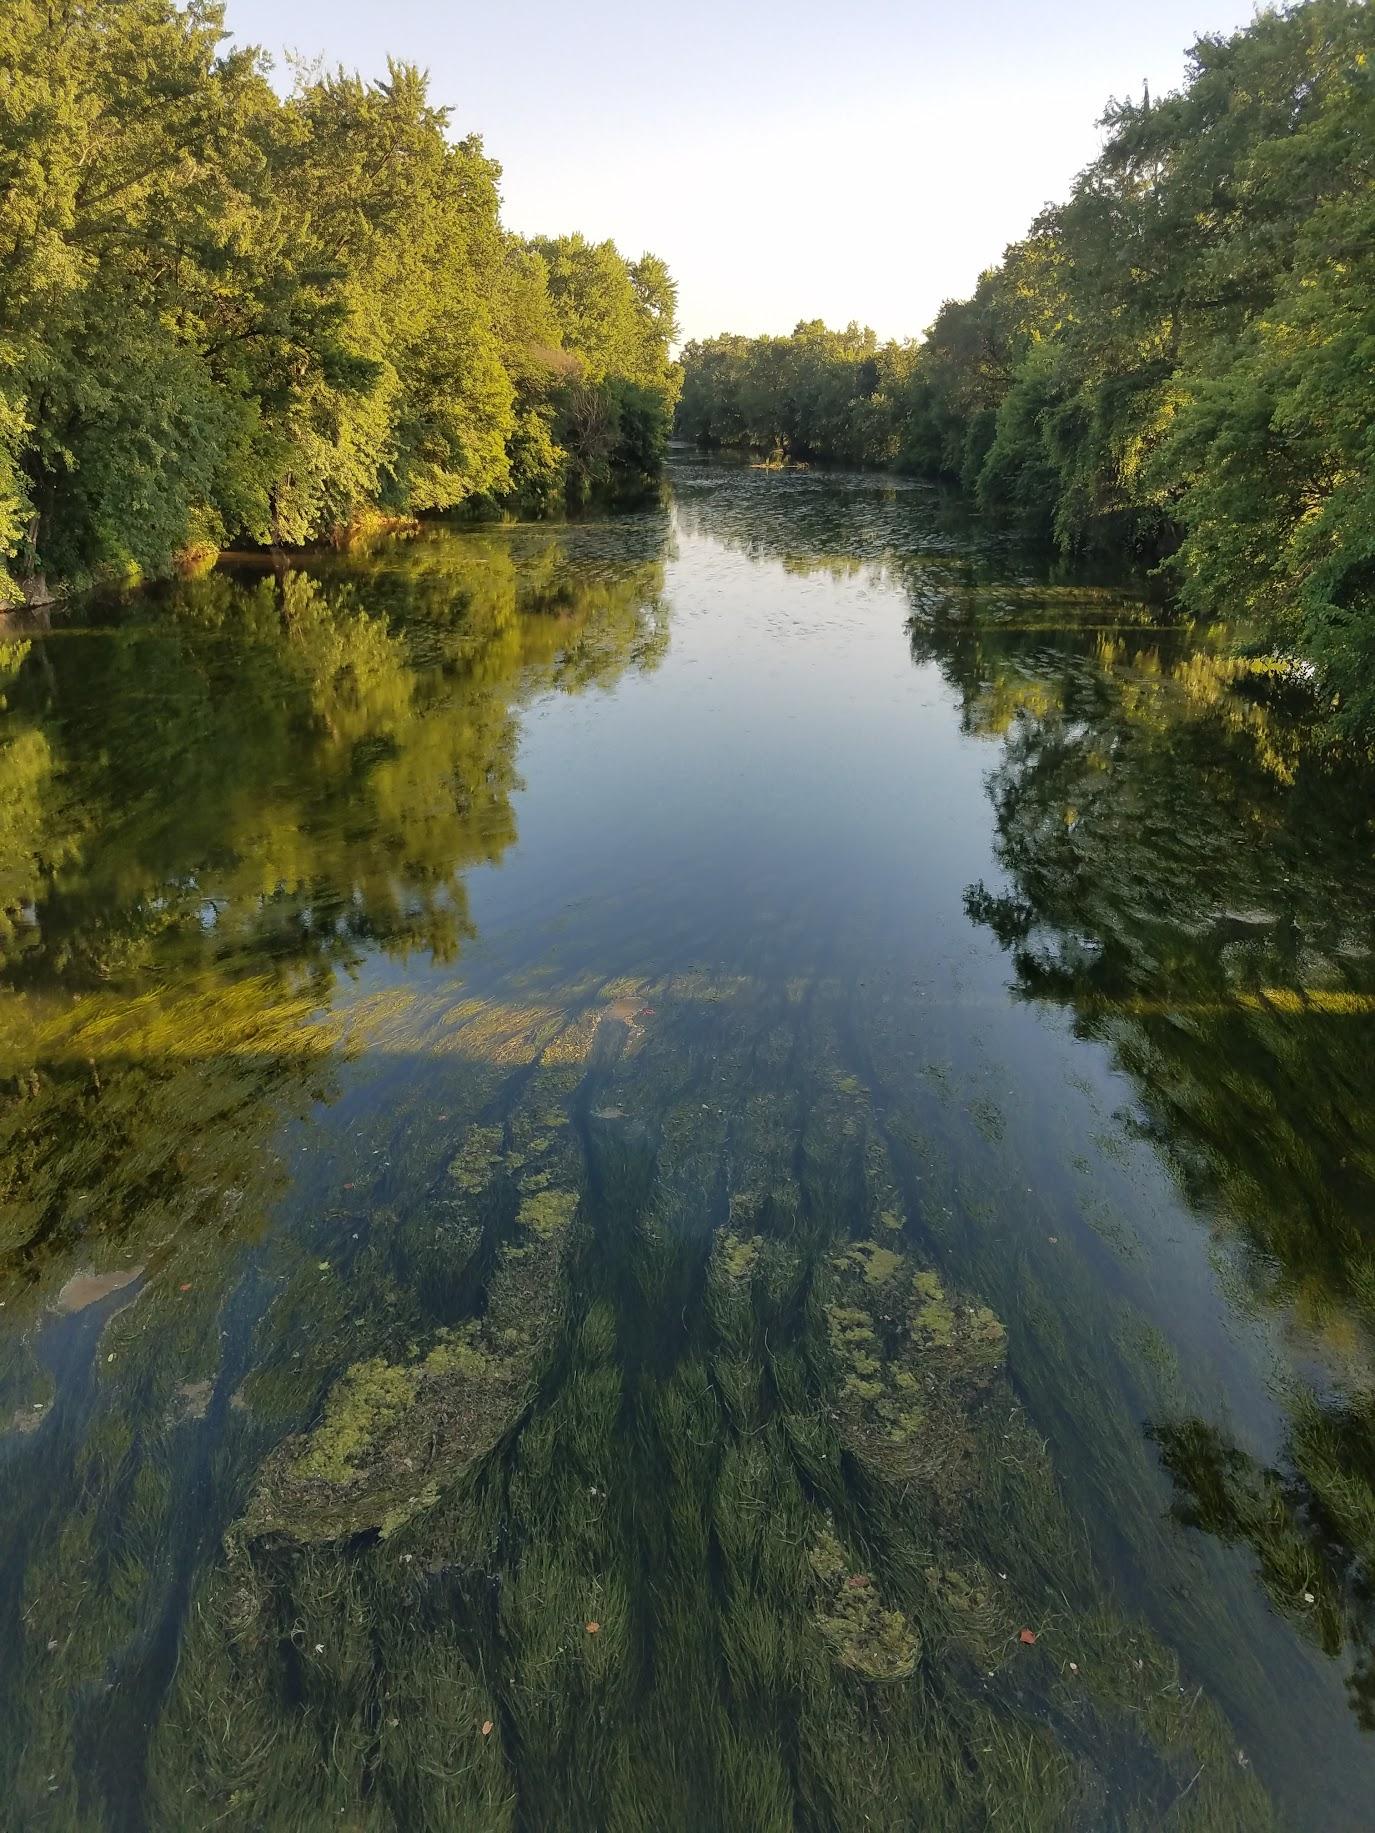 Susquehanna River, Selinsgrove, PA